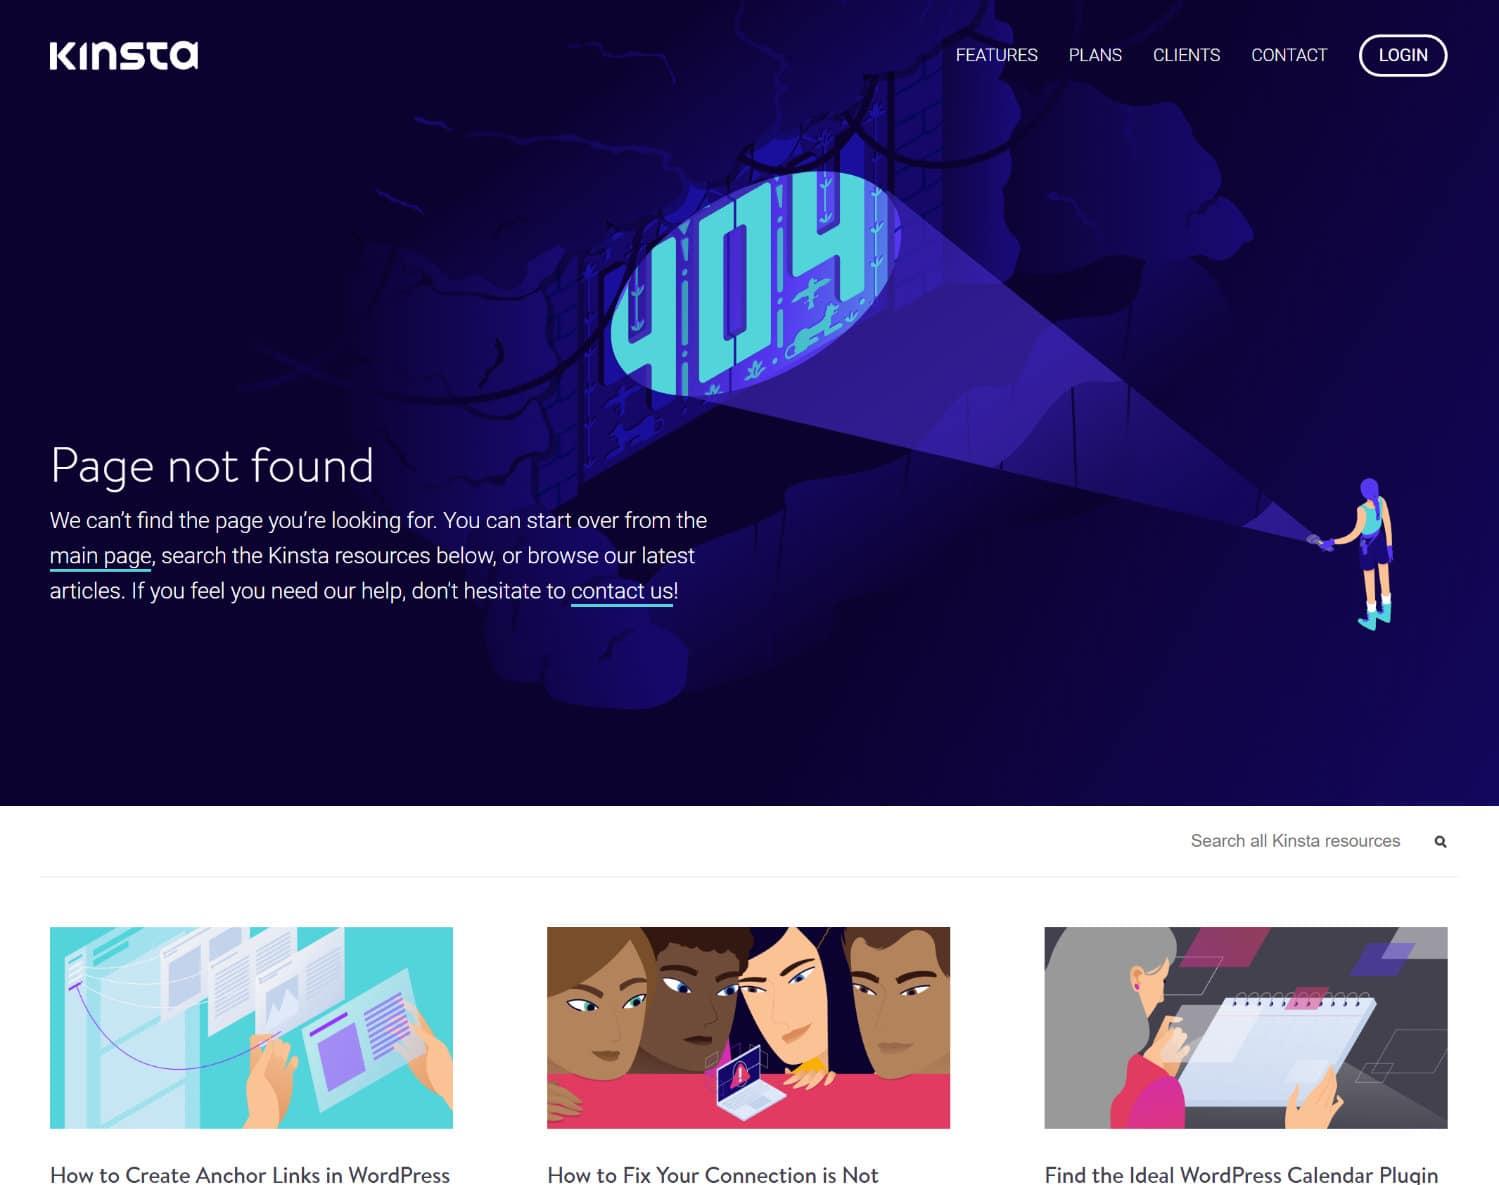 Pagina 404 di Kinsta